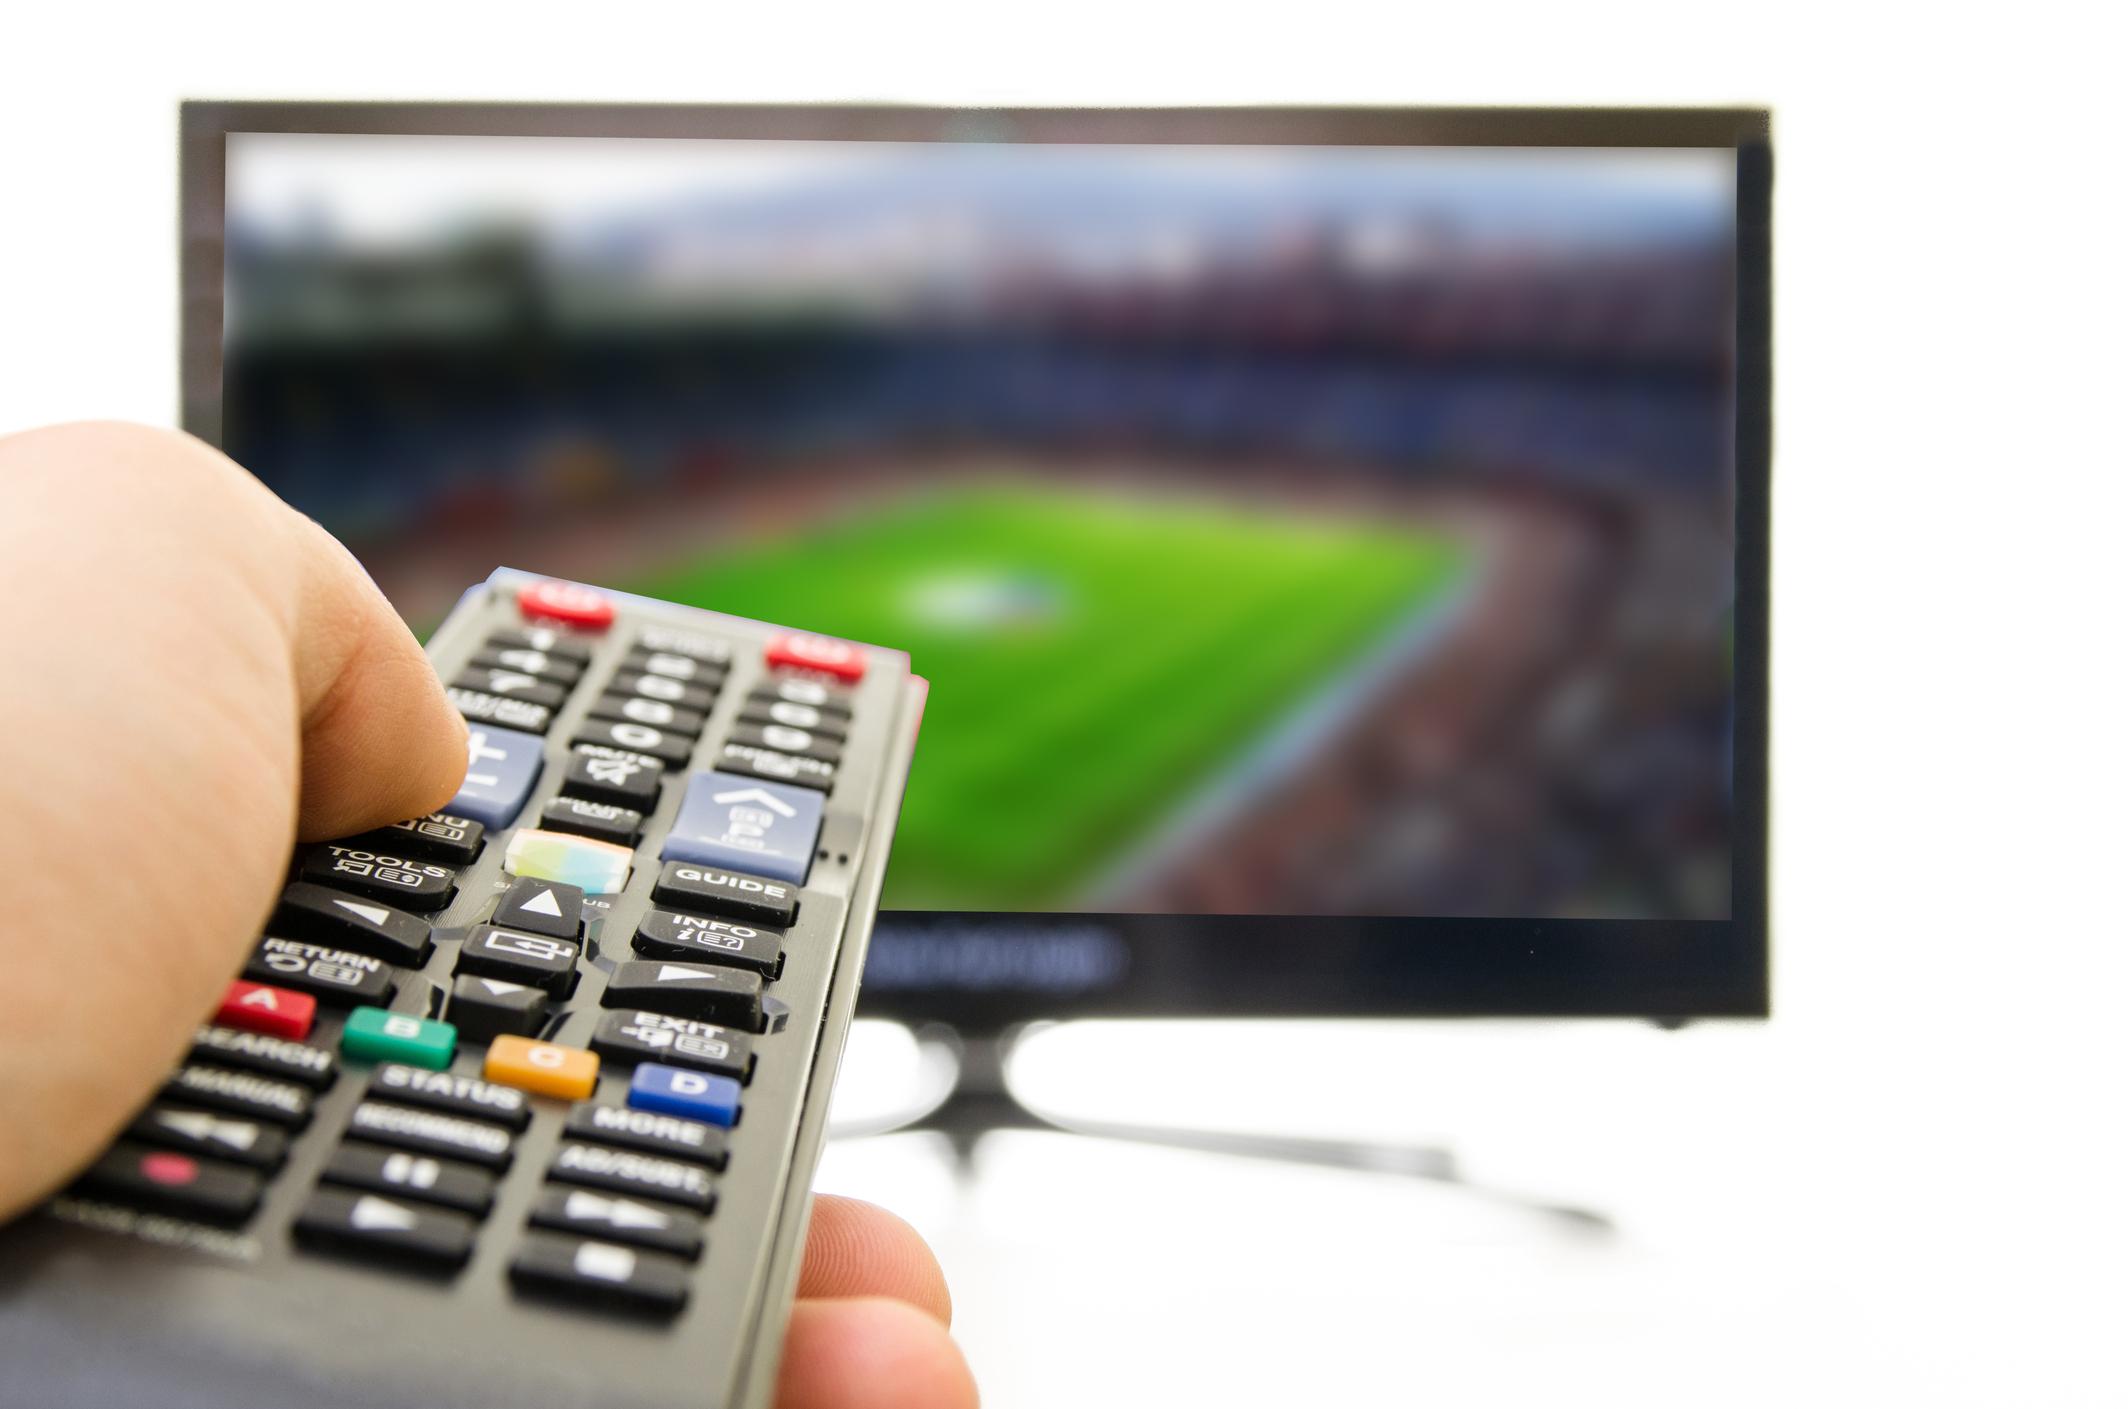 Sony's live TV service is struggling